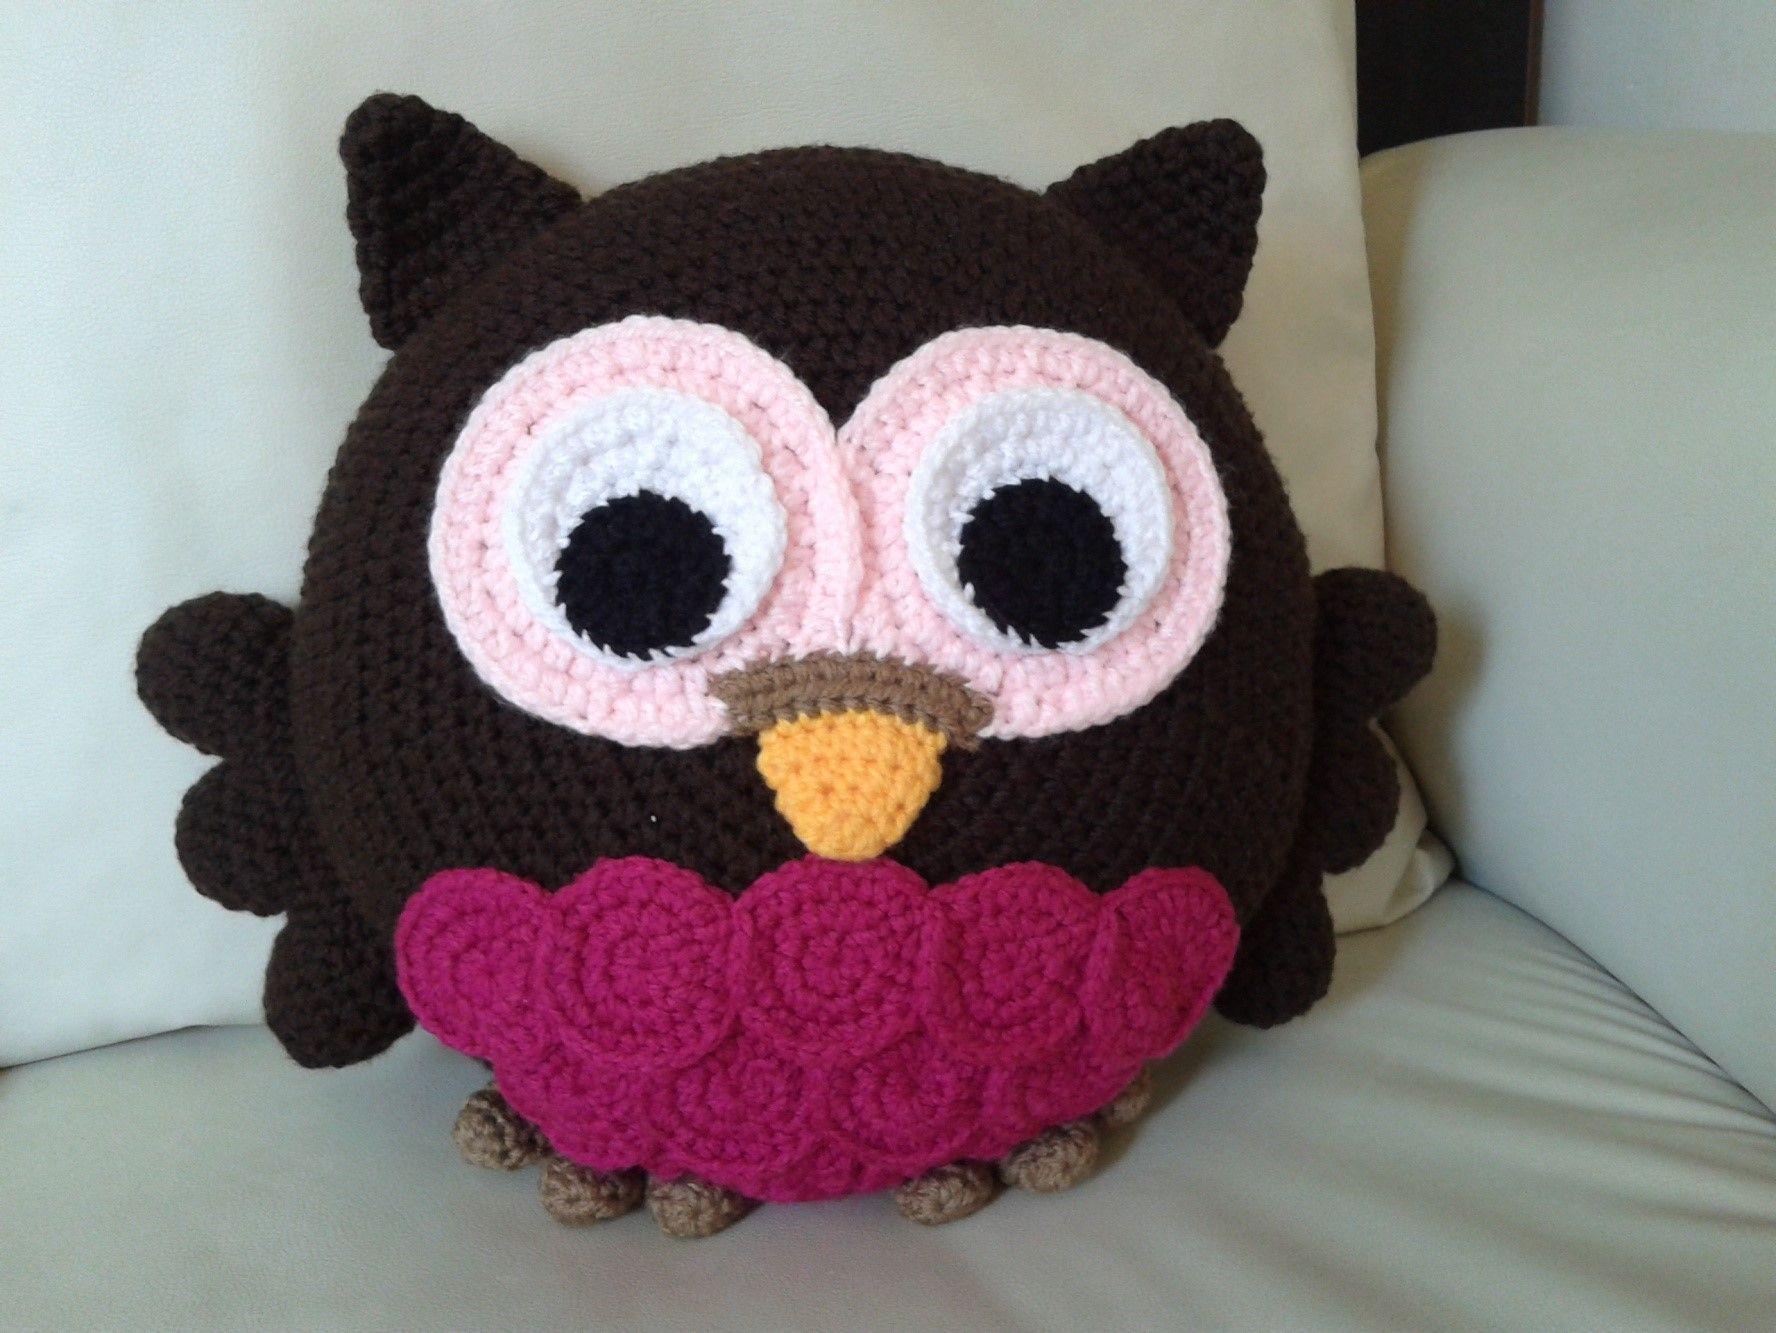 Amigurumi Patrones Gratis De Buho : Patrón de cojín de búho crochet owl pillows crochet owls and